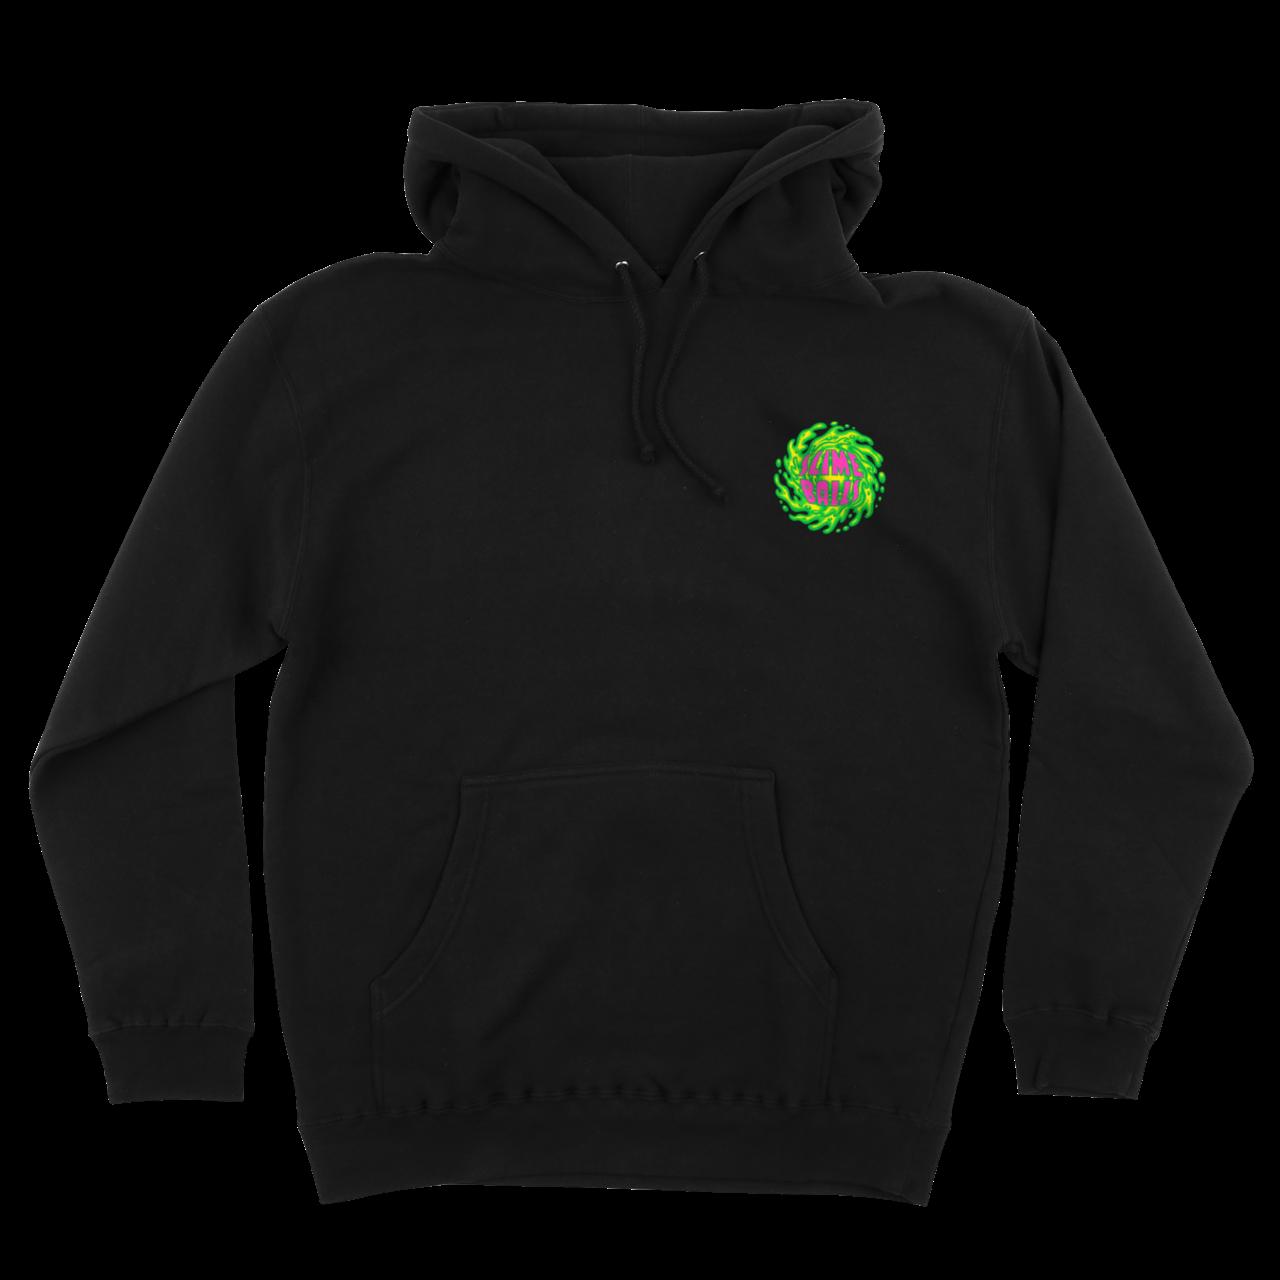 Slime Balls Logo Hooded Sweatshirt black